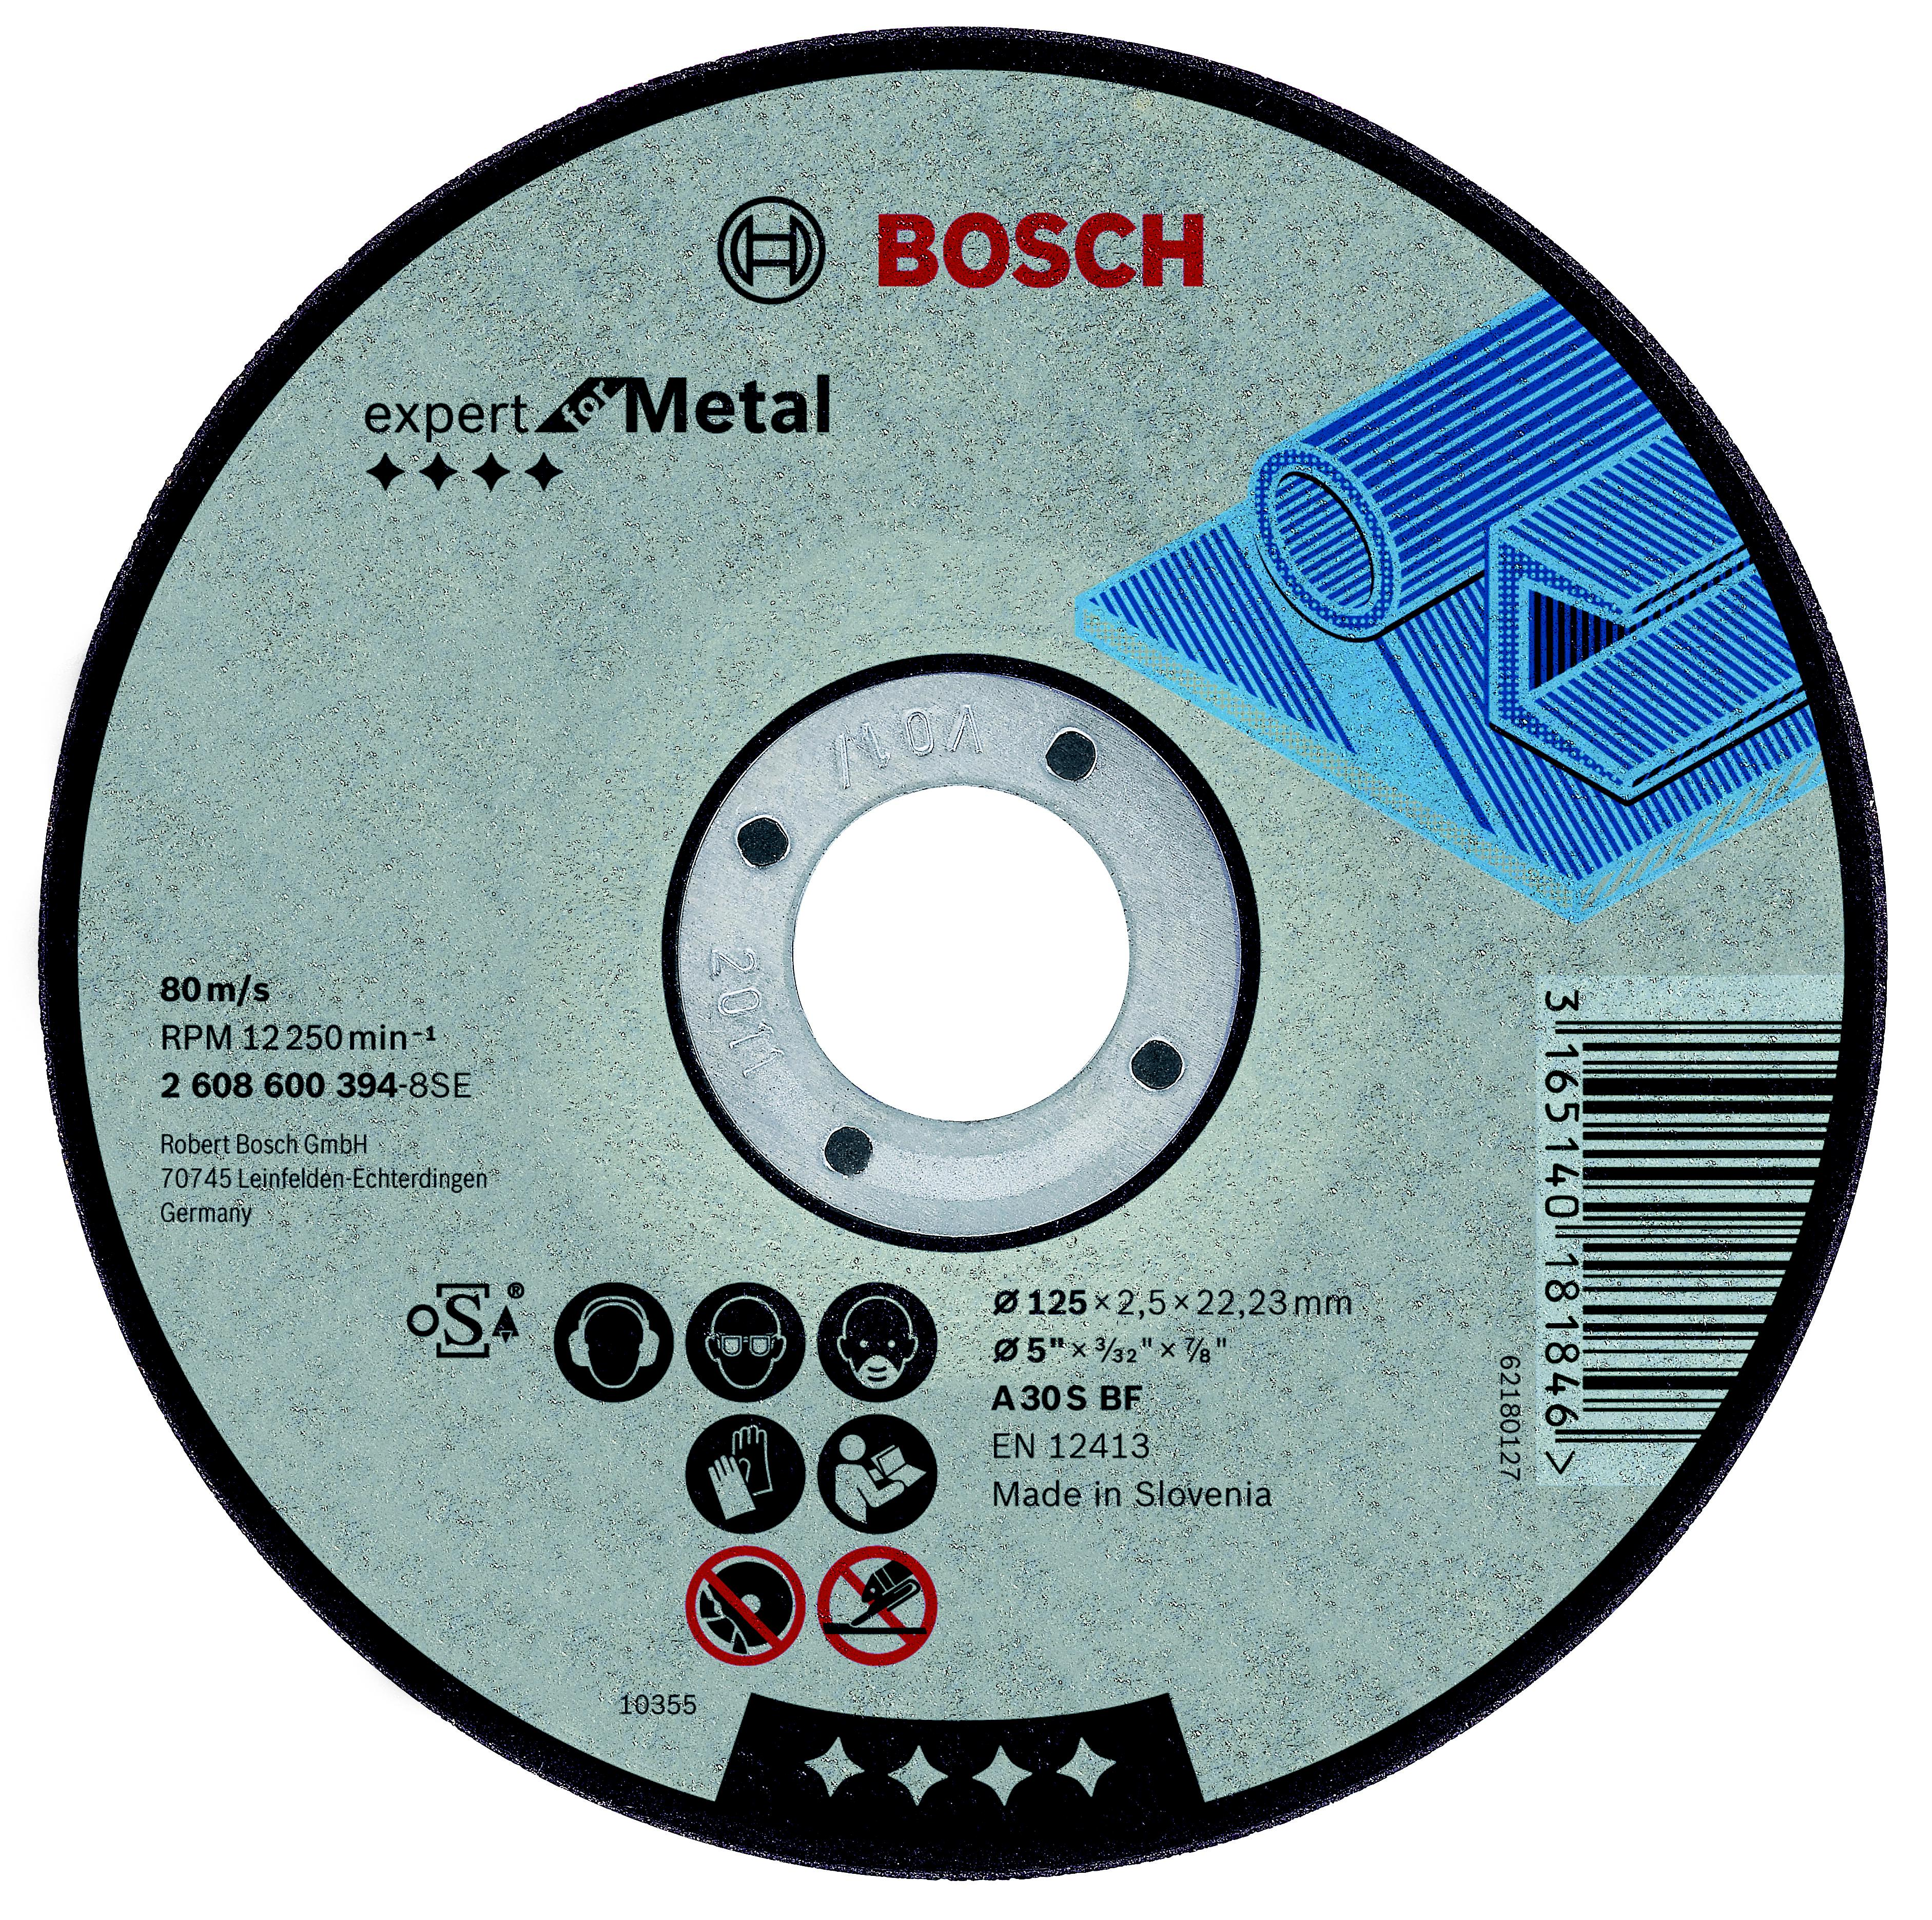 Круг отрезной Bosch 300х3.2х22 expert for metal (2.608.600.649) круг отрезной bosch expert for metal 230x1 9x22 2 608 603 400